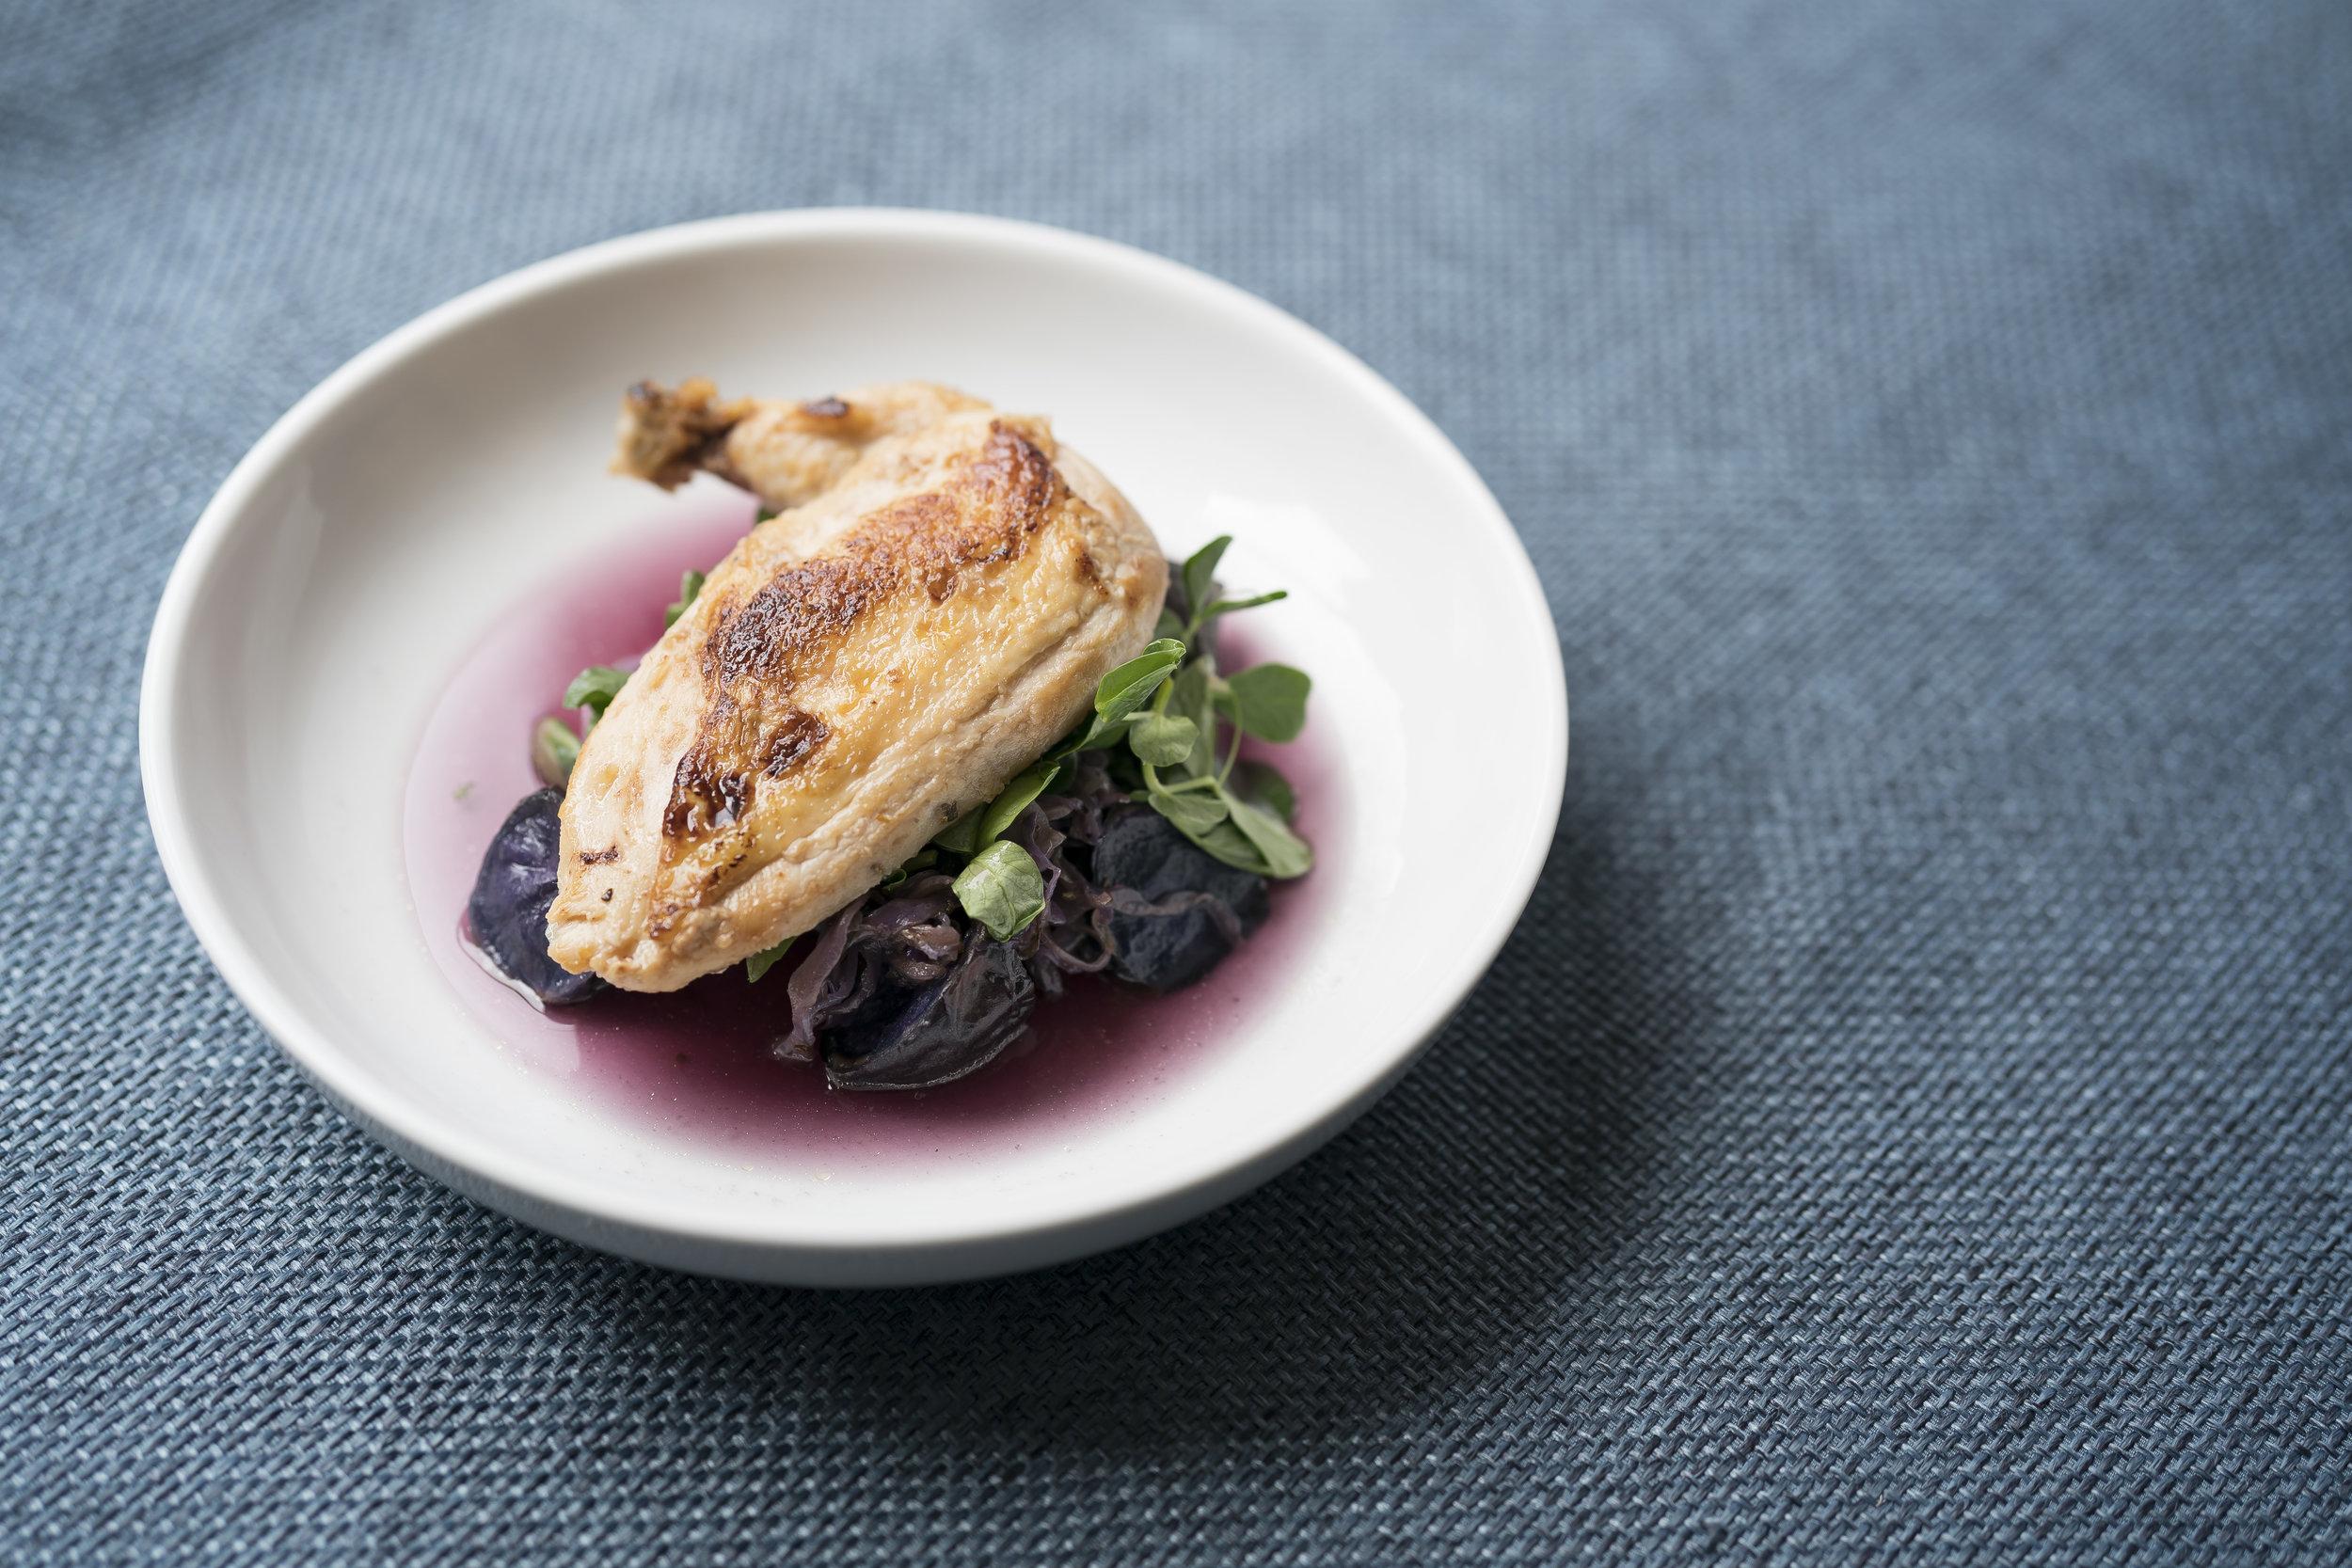 House Cured Roast Chicken_Main_Fall 18 GP Tasting_BH_33.JPG